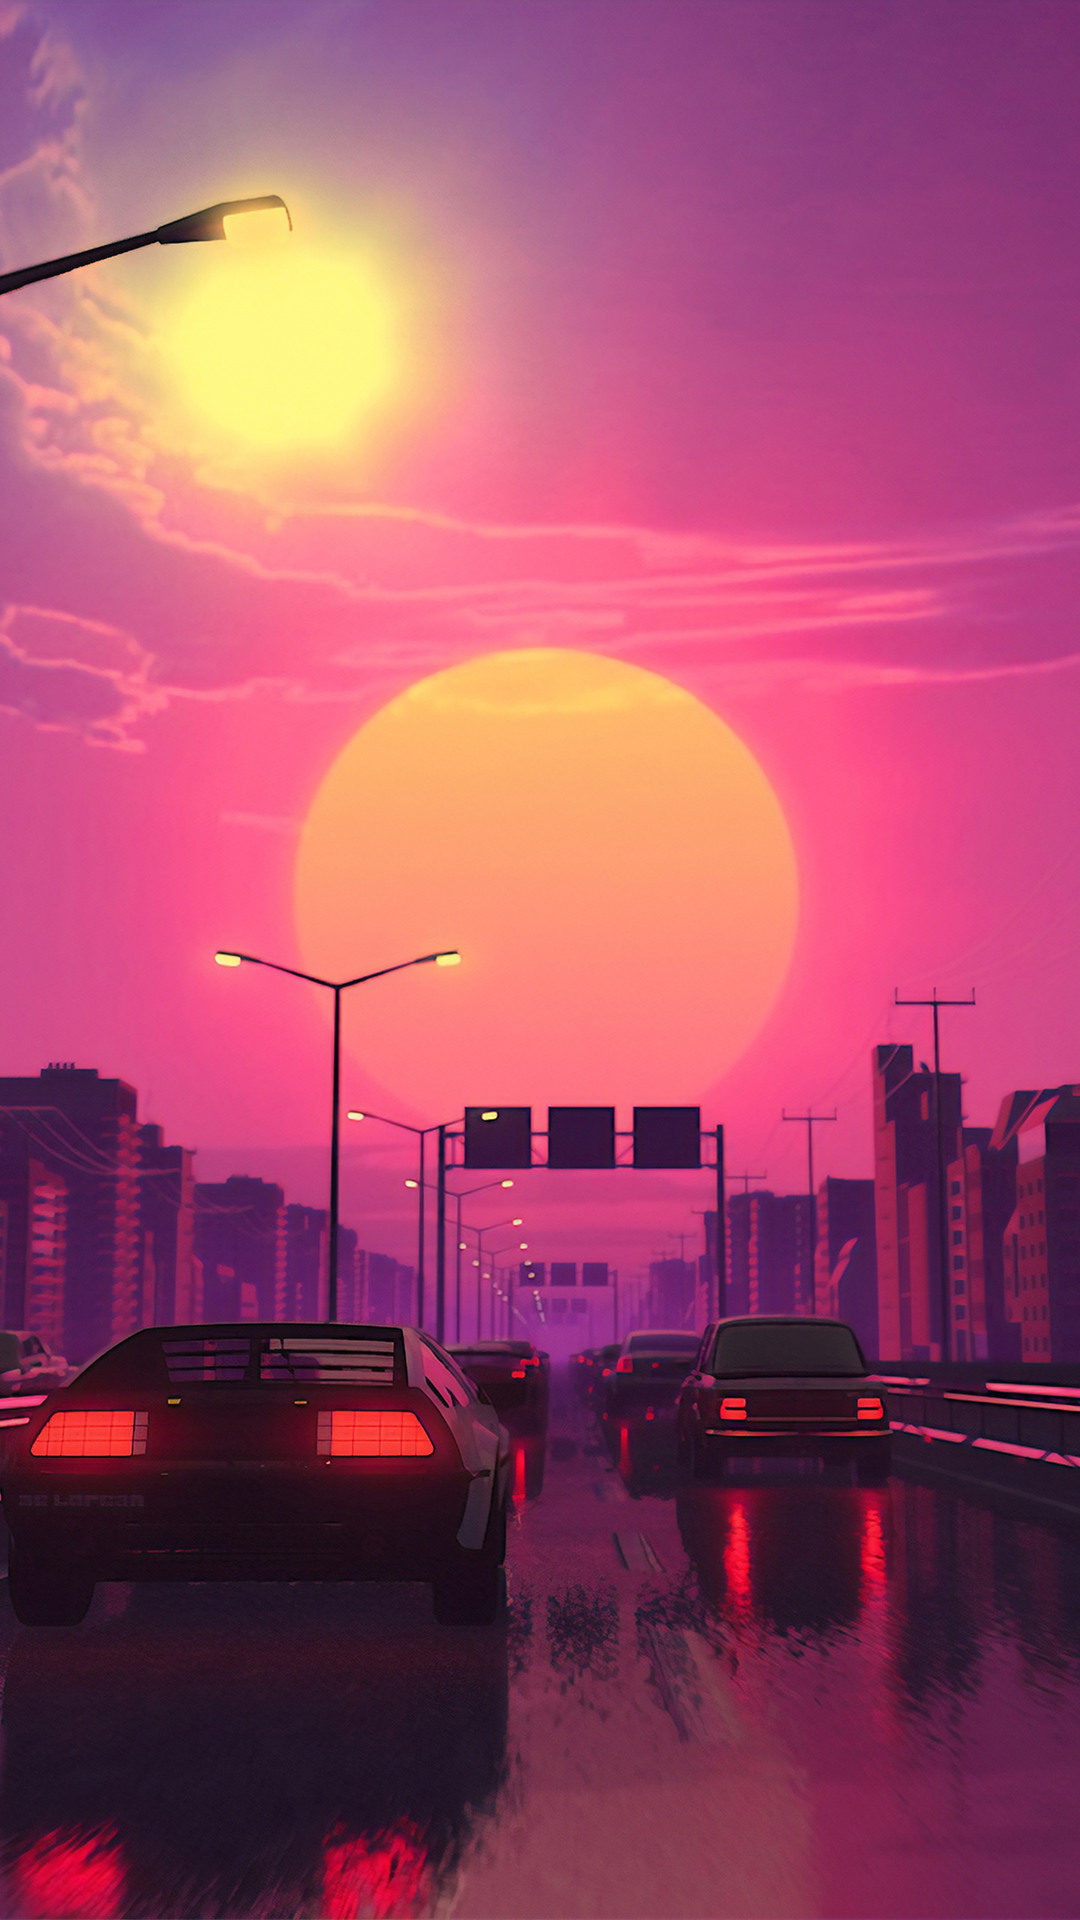 Toyota supra drift live wallpaper. Neon City Car Retrowave Synthwave Digital Art 4k Wallpaper 91